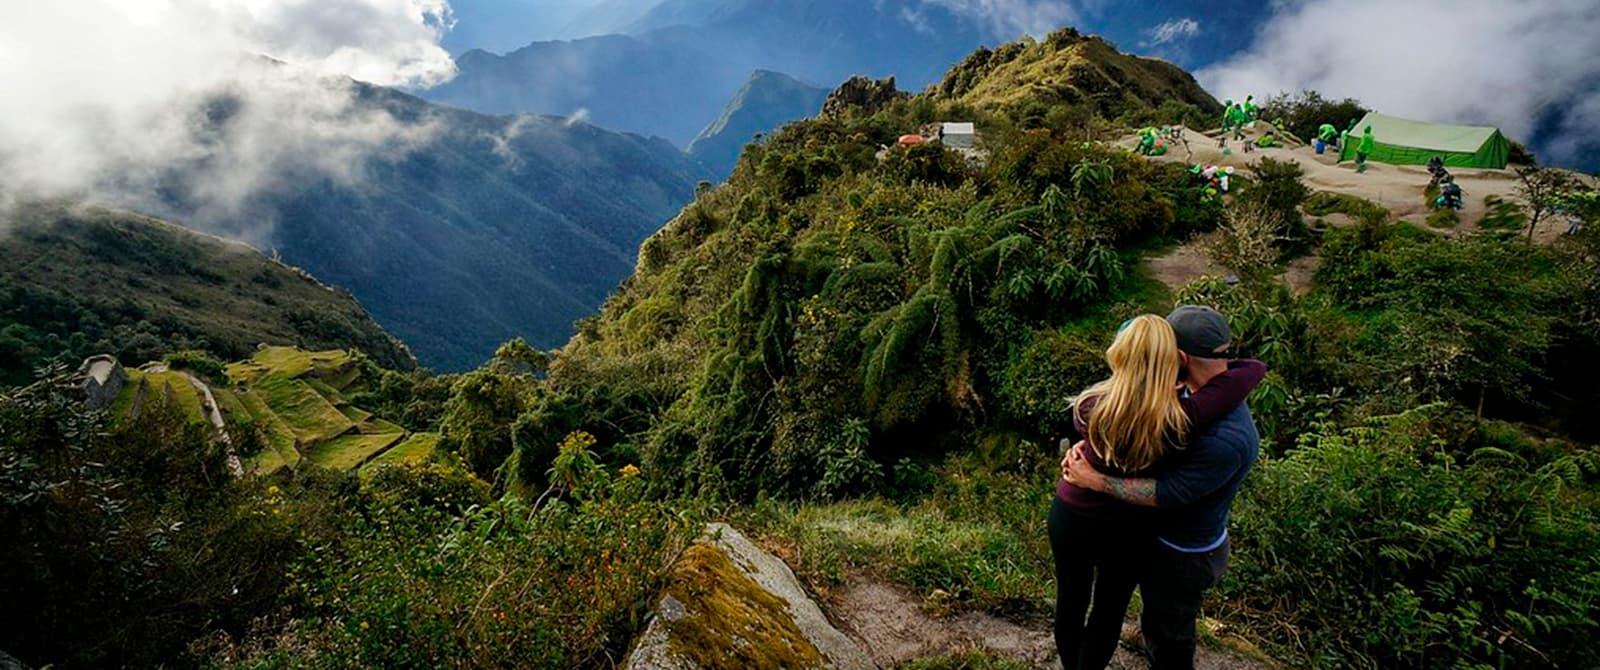 inka trail to machu picchu tour